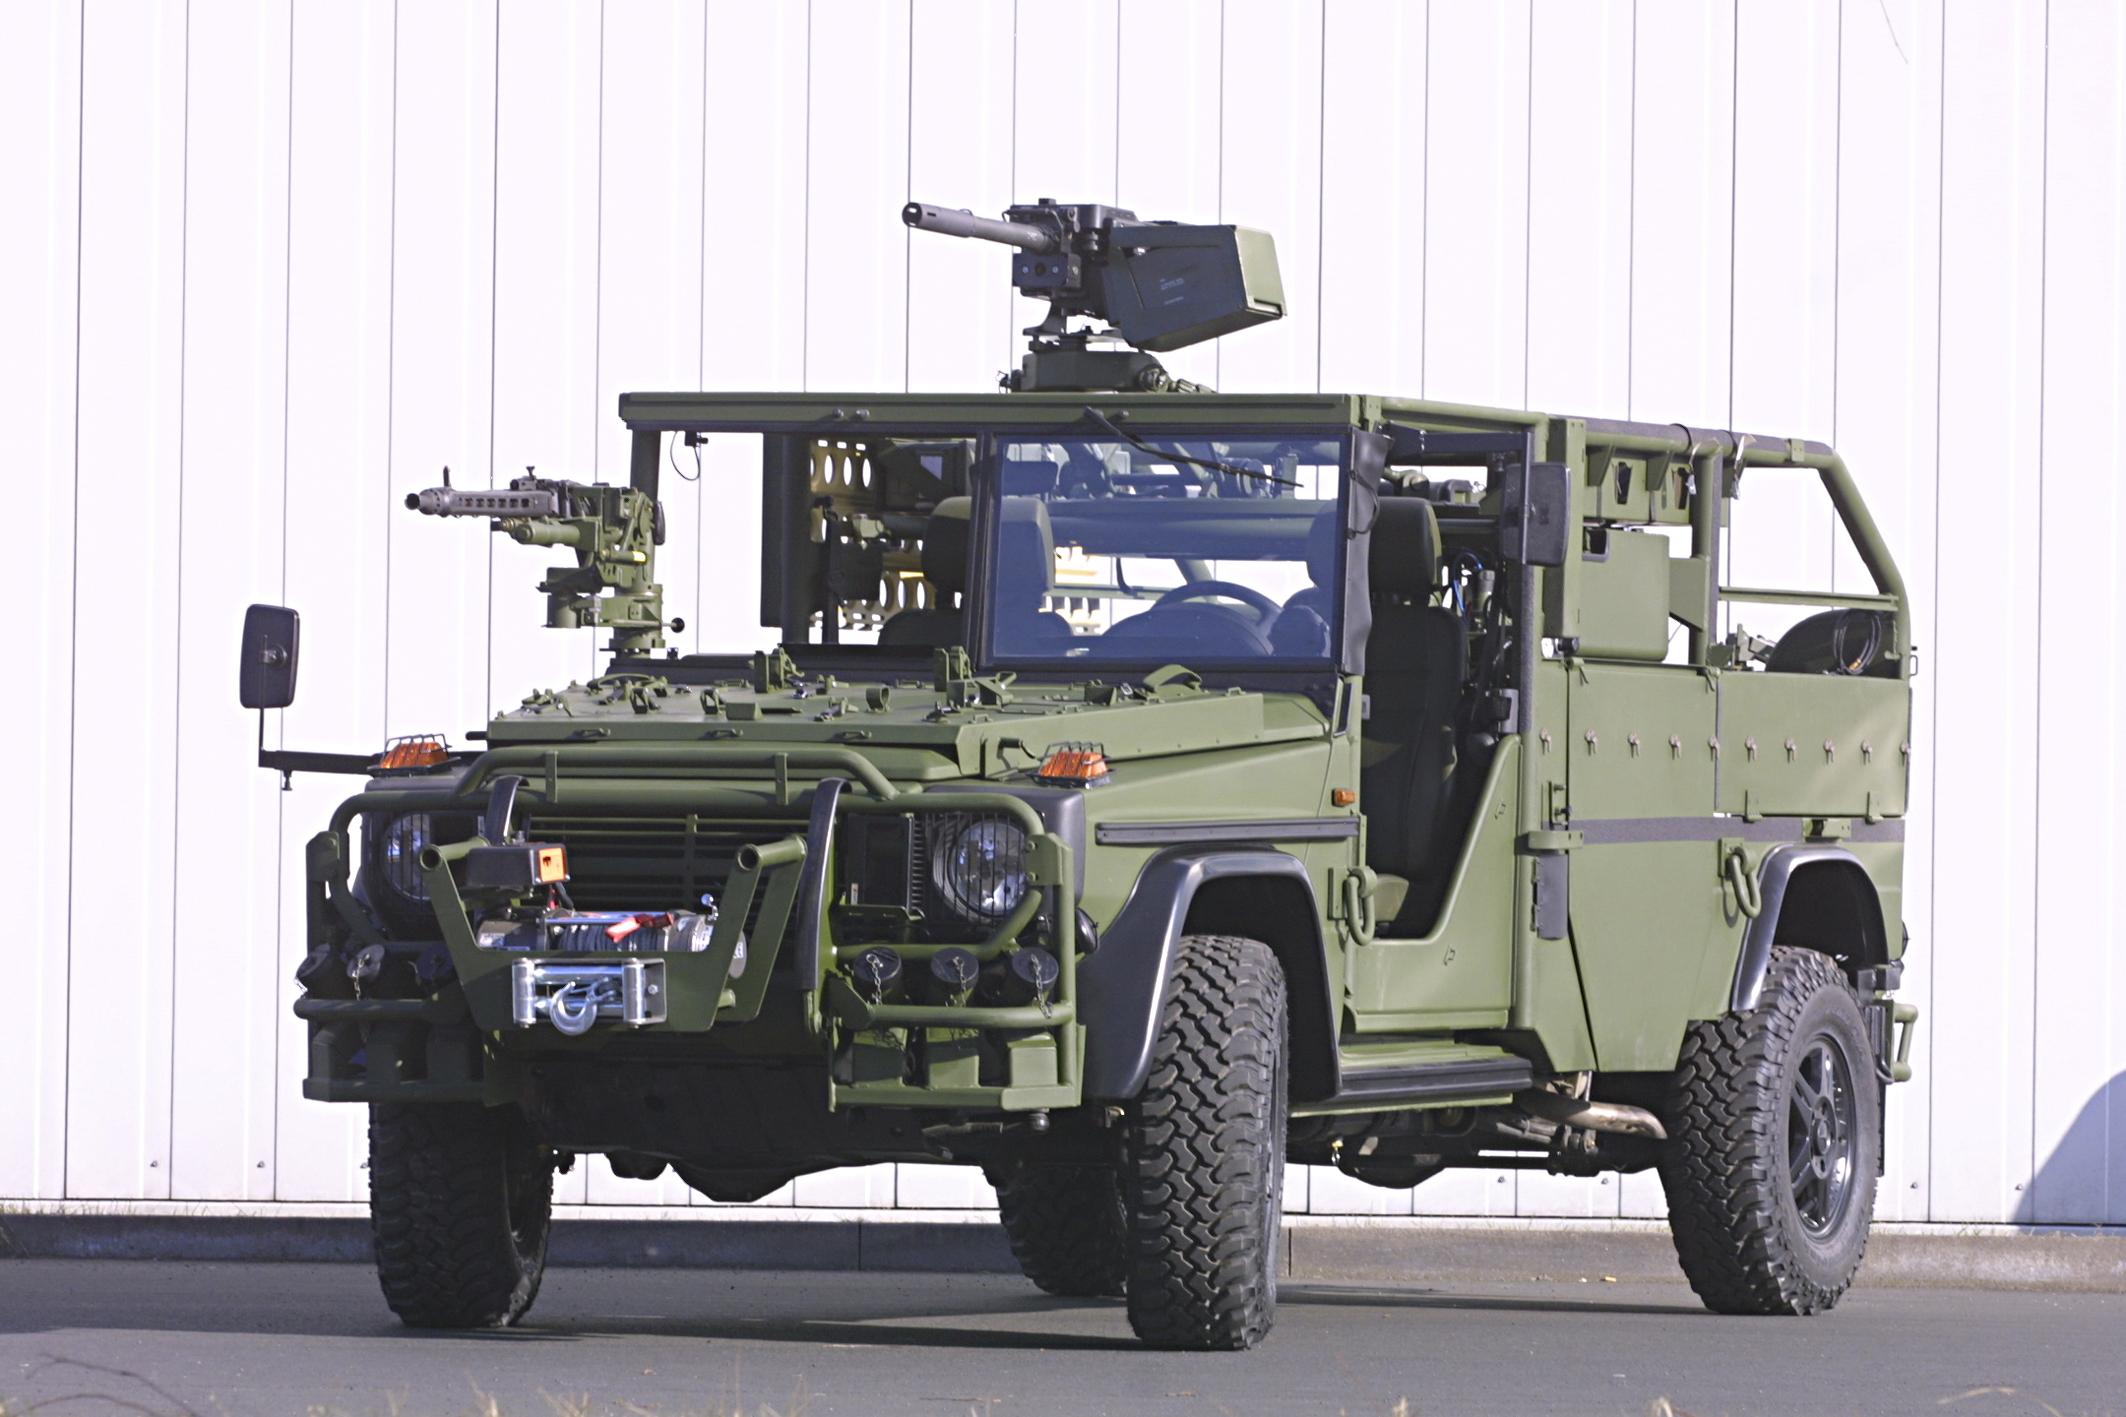 Classe g militare - ZombieDay